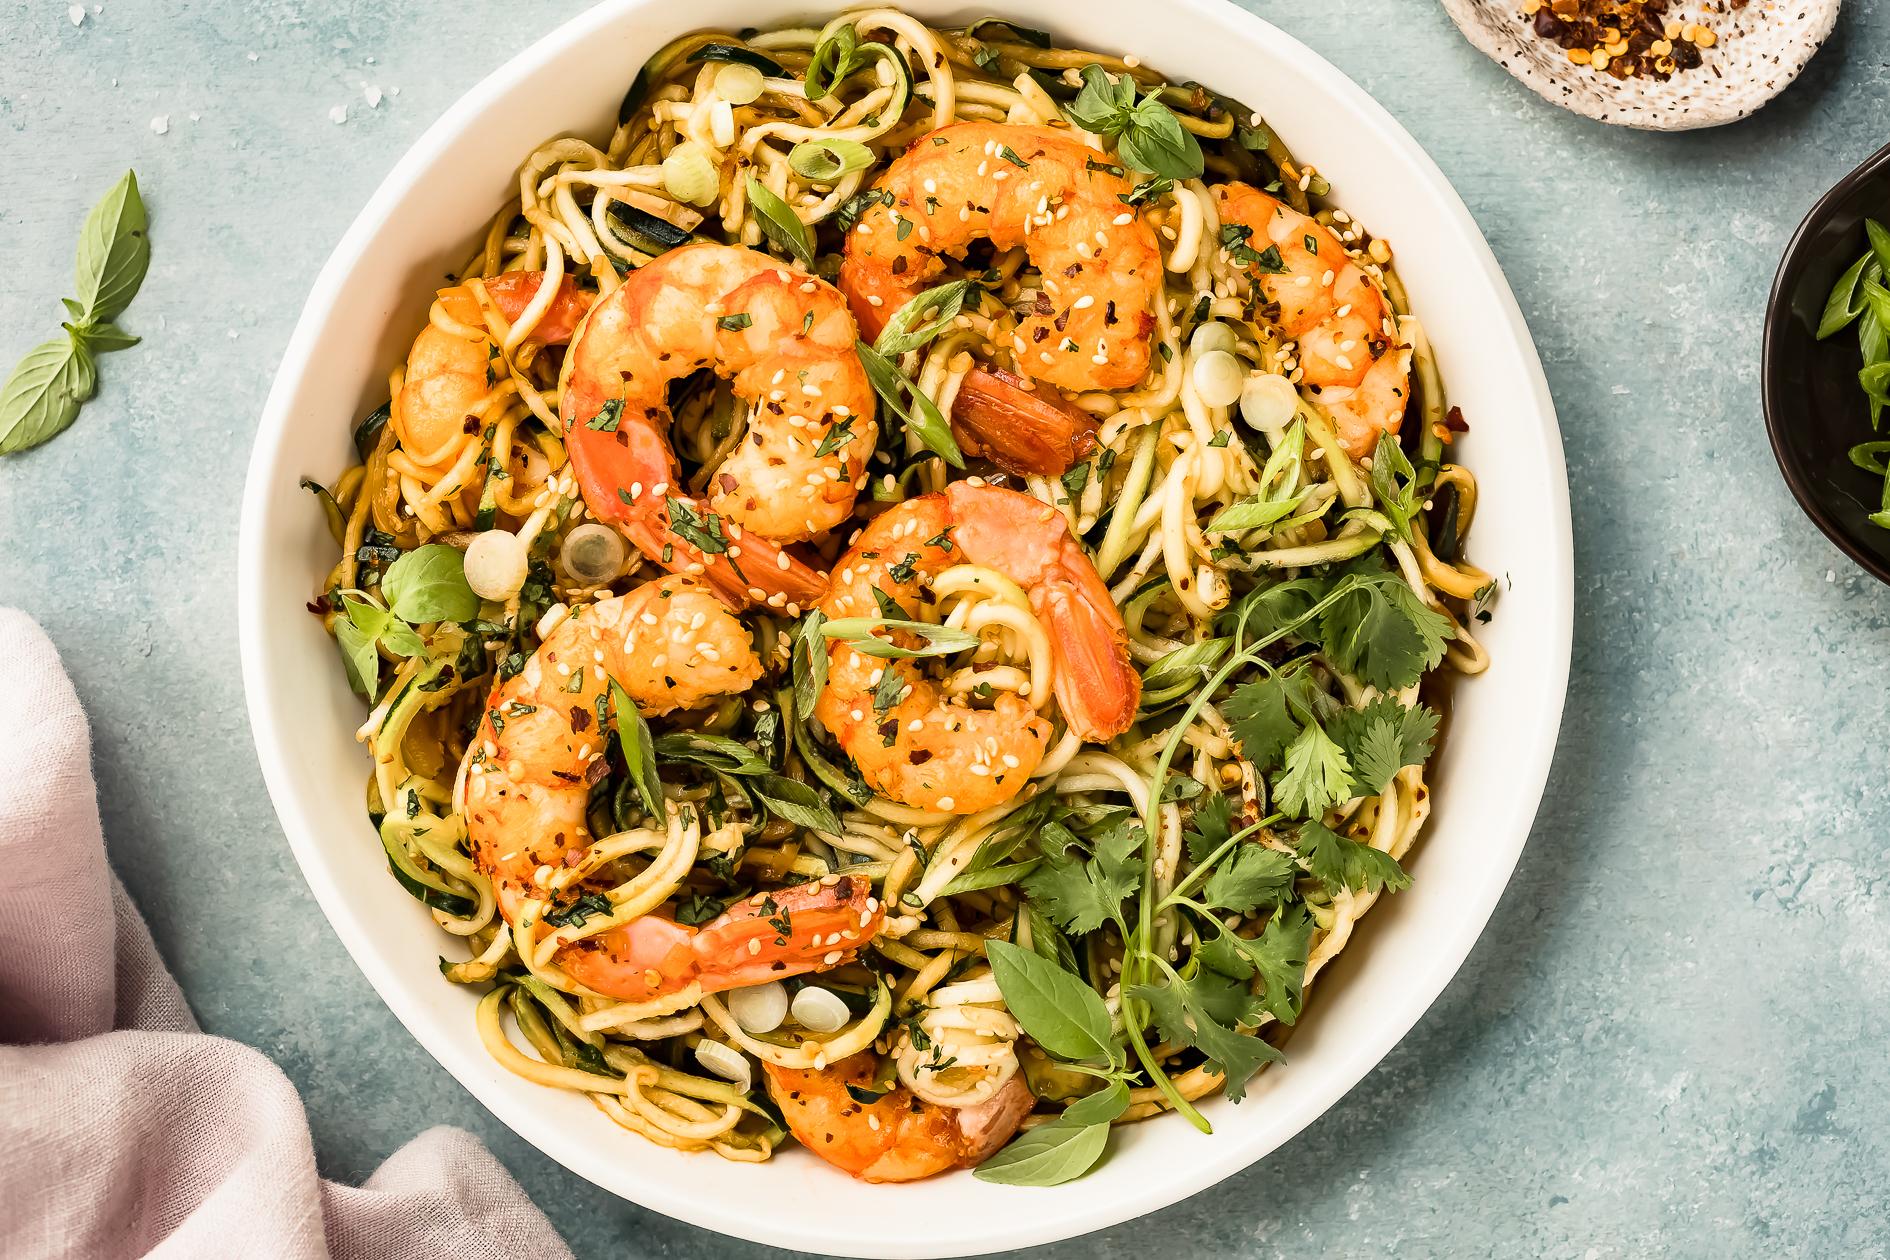 Healthy Vegetable Noodle Stir Fry